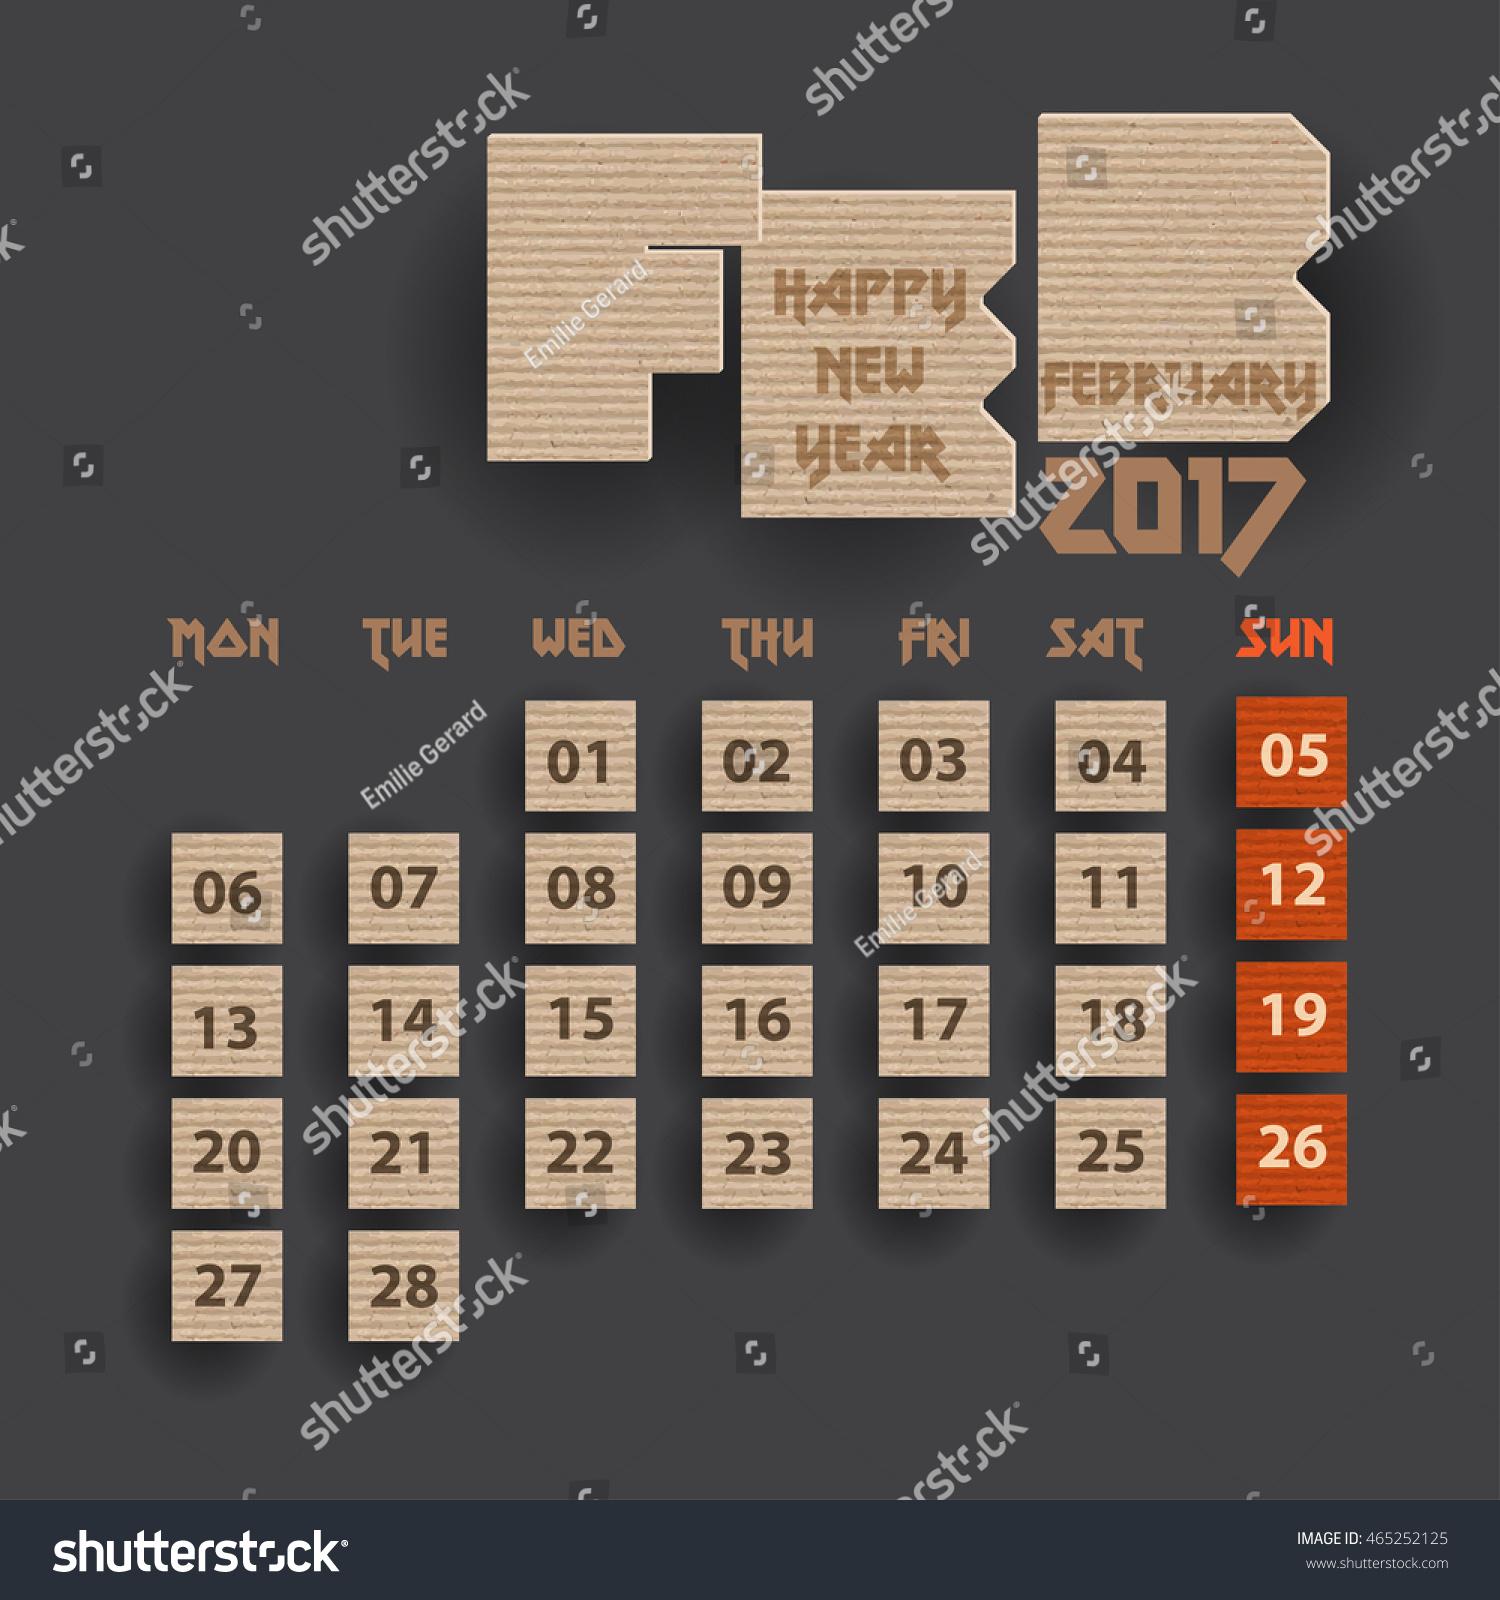 Calendar Typography Vector : Typography cardboard design february calendar stock